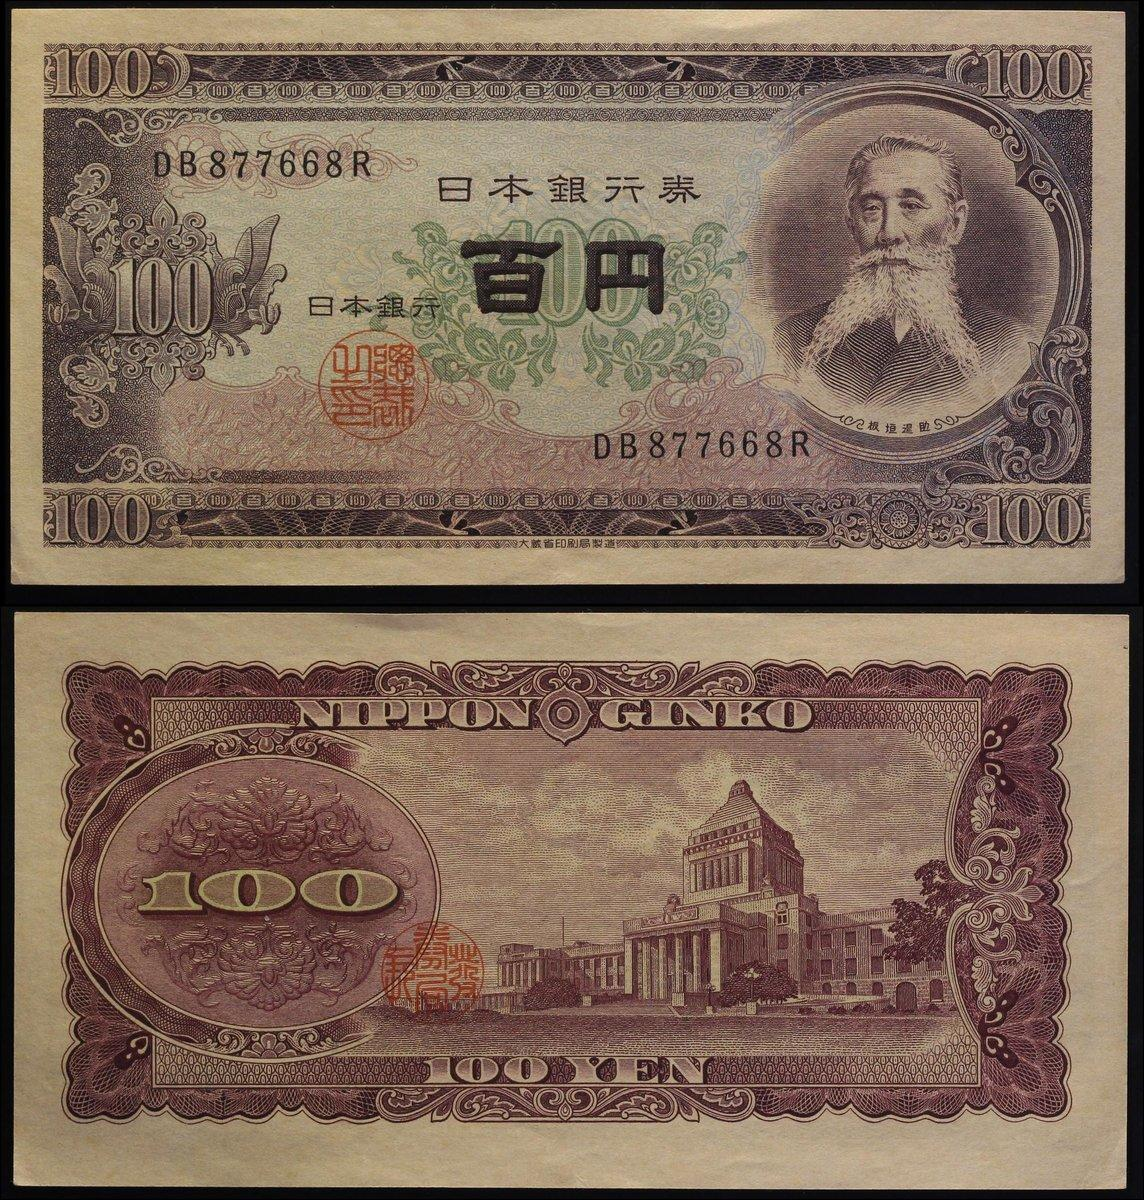 JAPAN 100 YEN ND 1953 P 90 b BROWN UNC